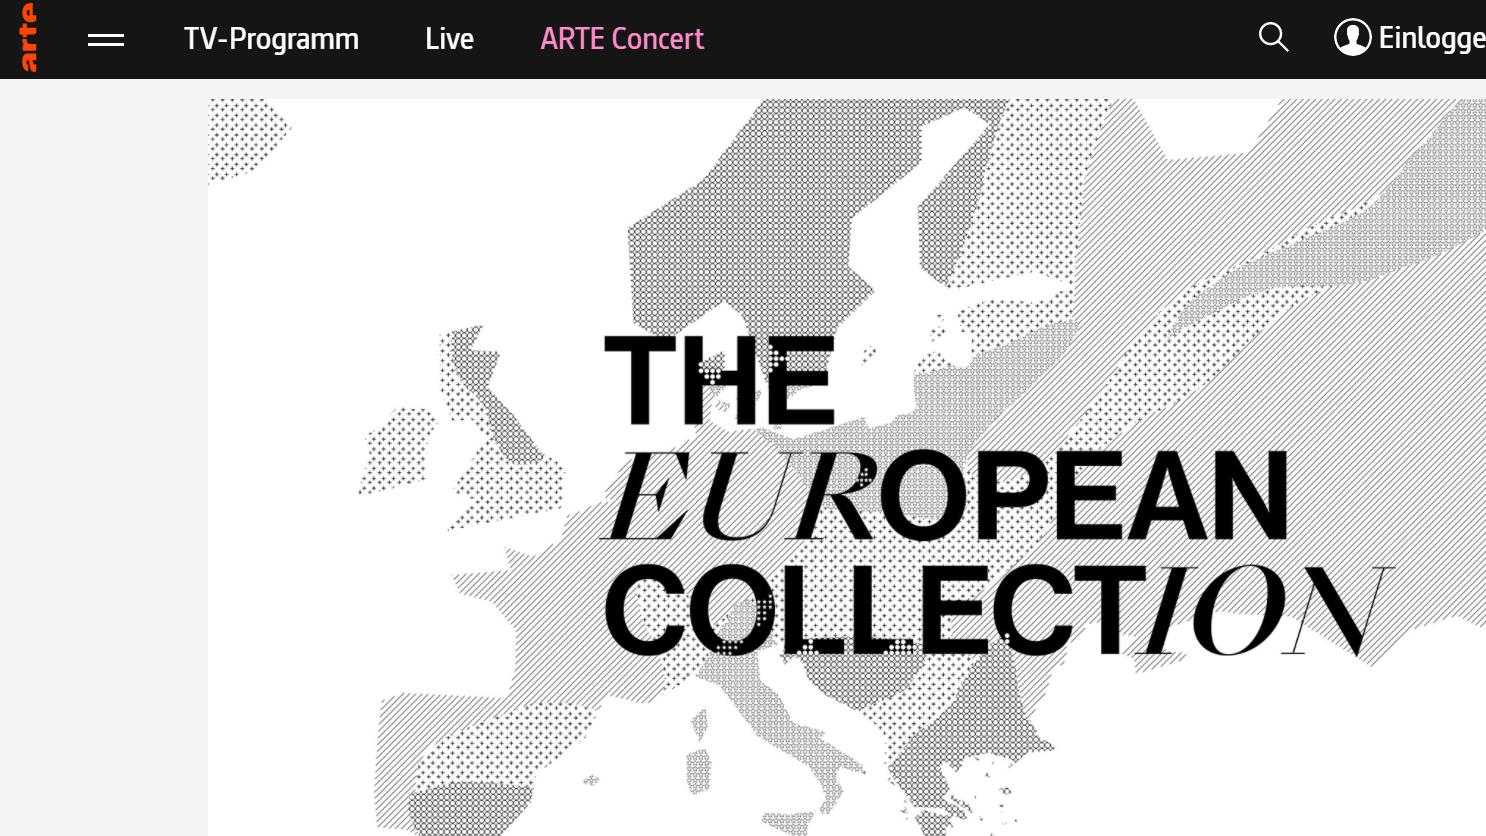 The-European-Collection-Arte-in-Partnerschaft-mit-ARD-ZDF-France-T-l-visions-und-SRG-SSR